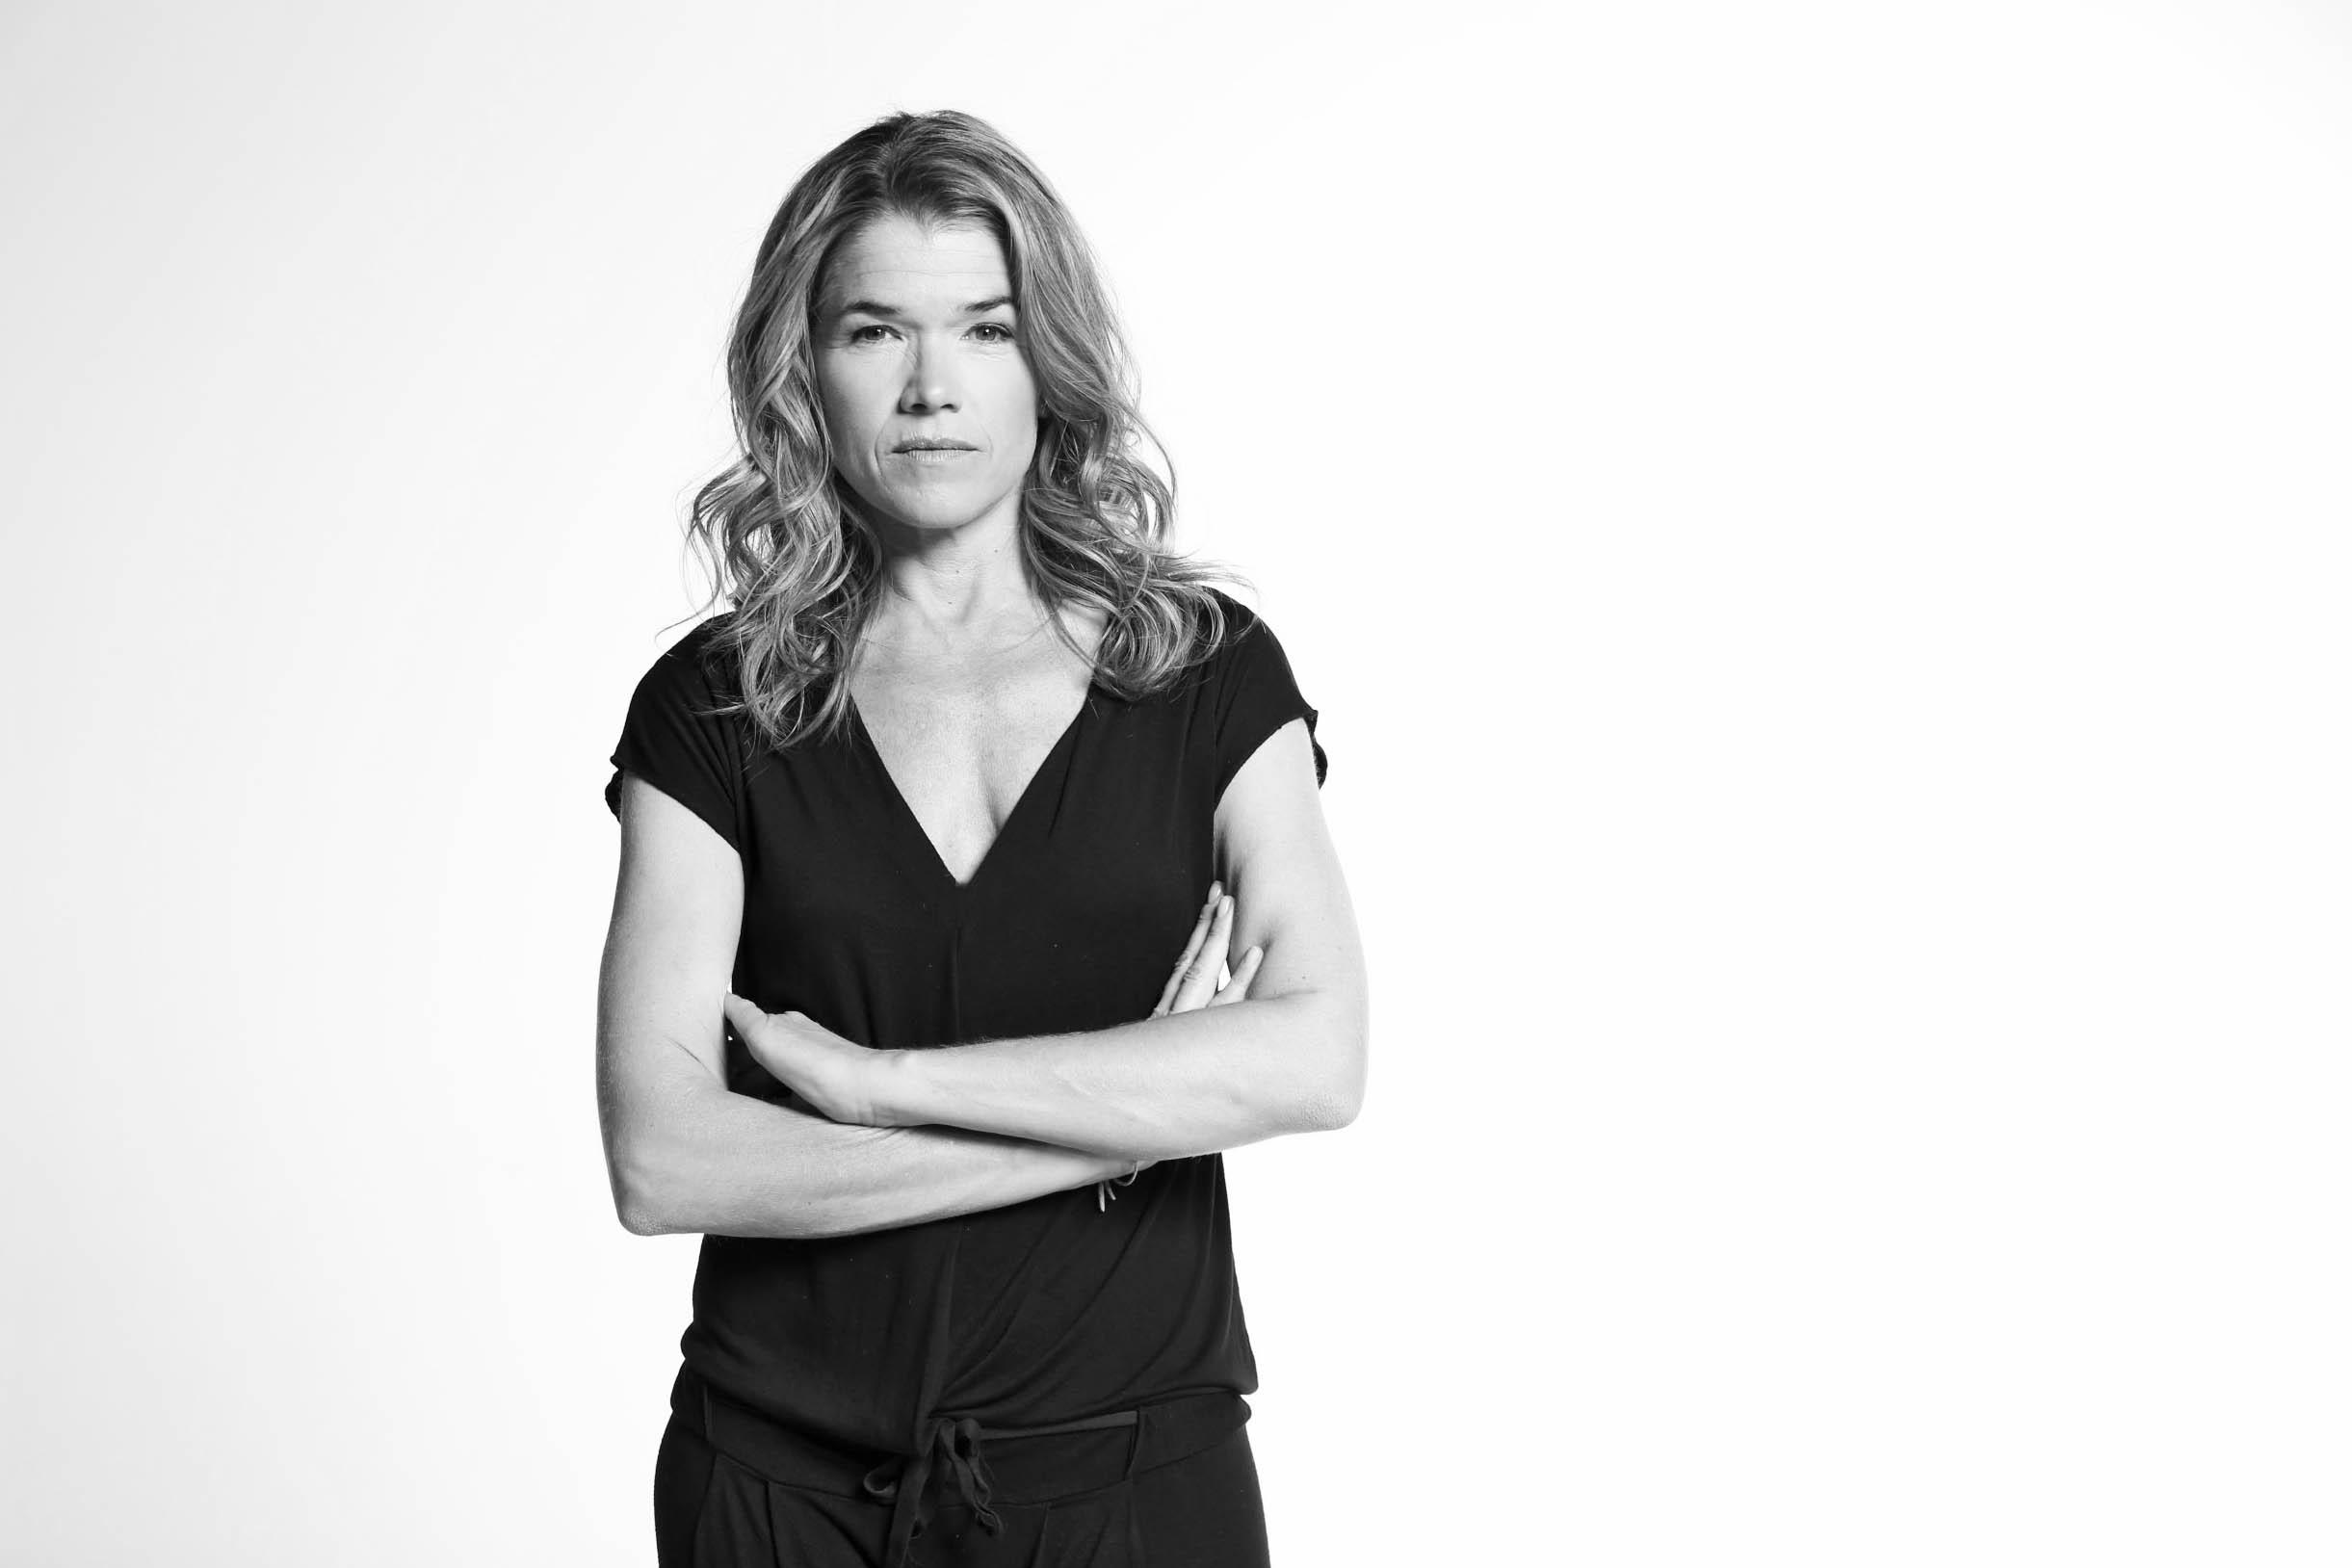 Anke Engelke in Tomas Studio, Mai 2015